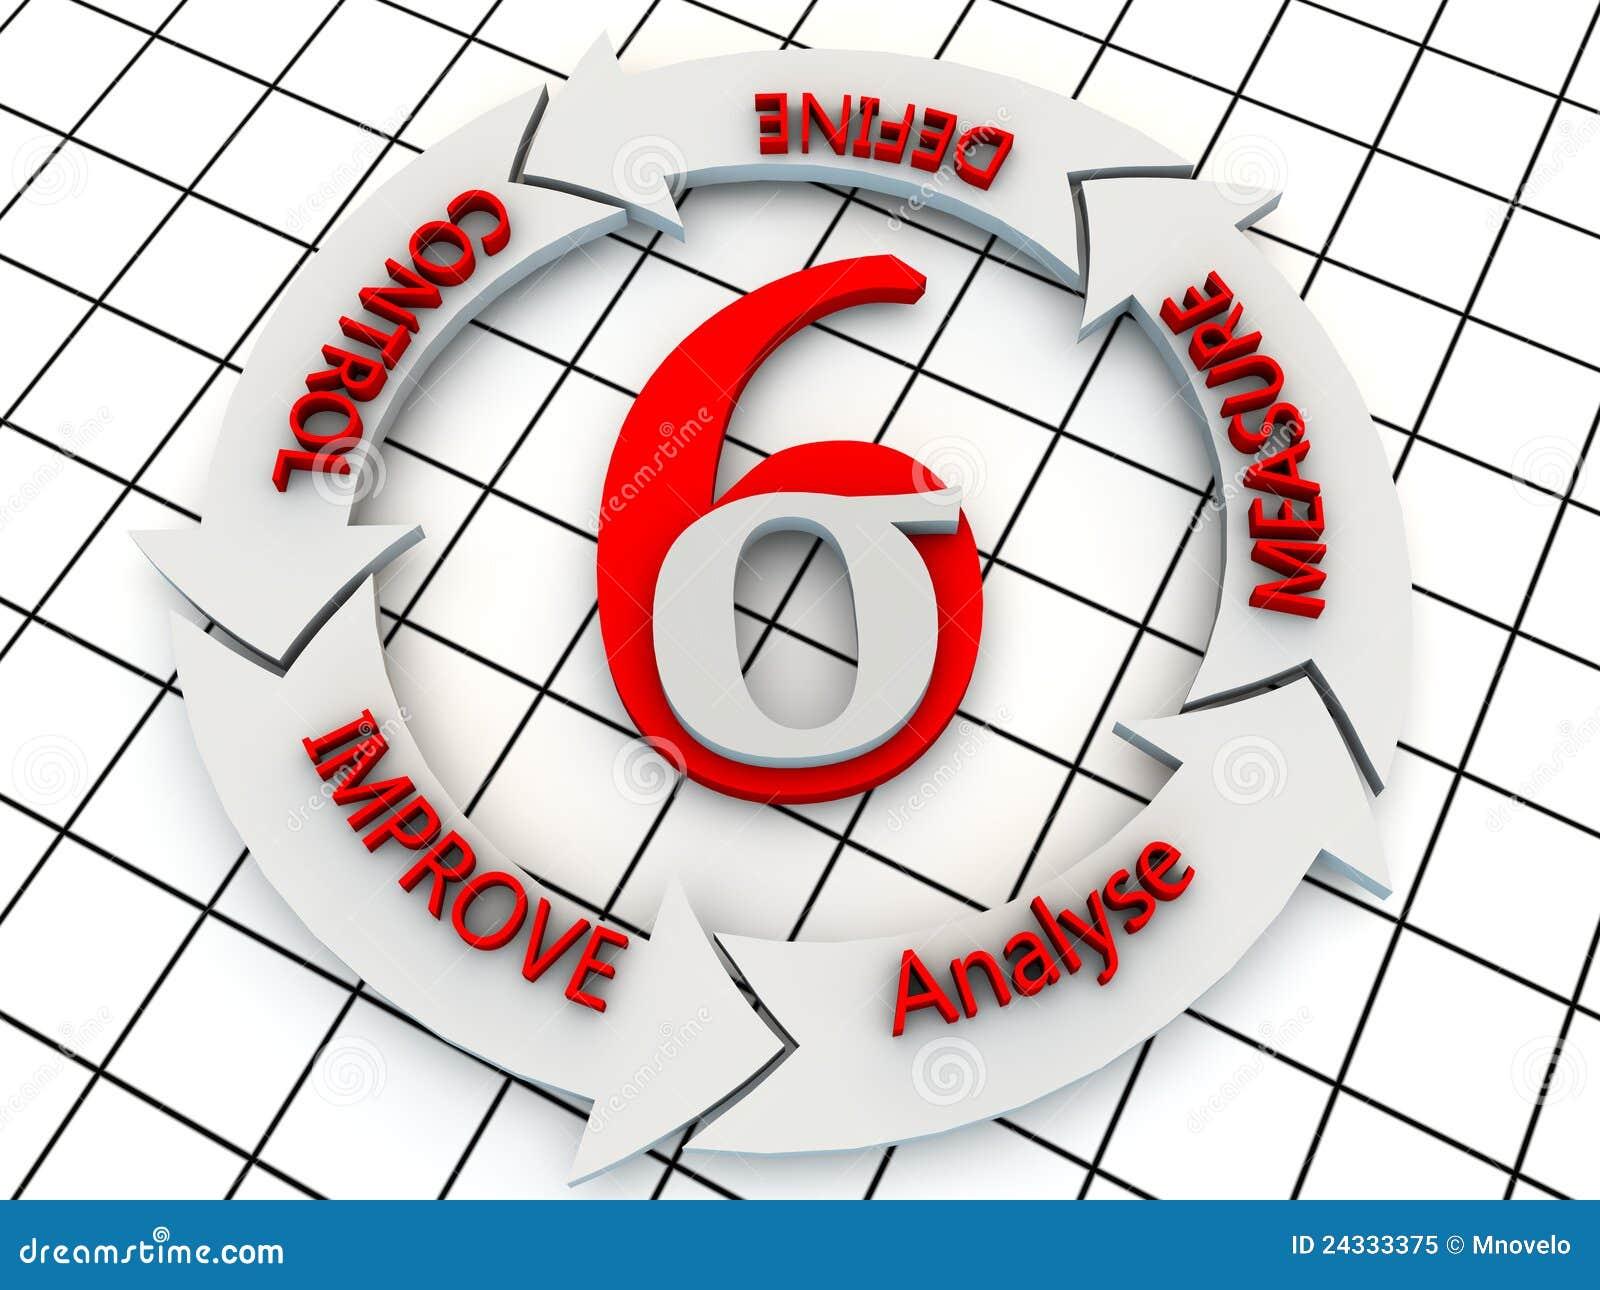 strategic entrepreneurship 4th edition